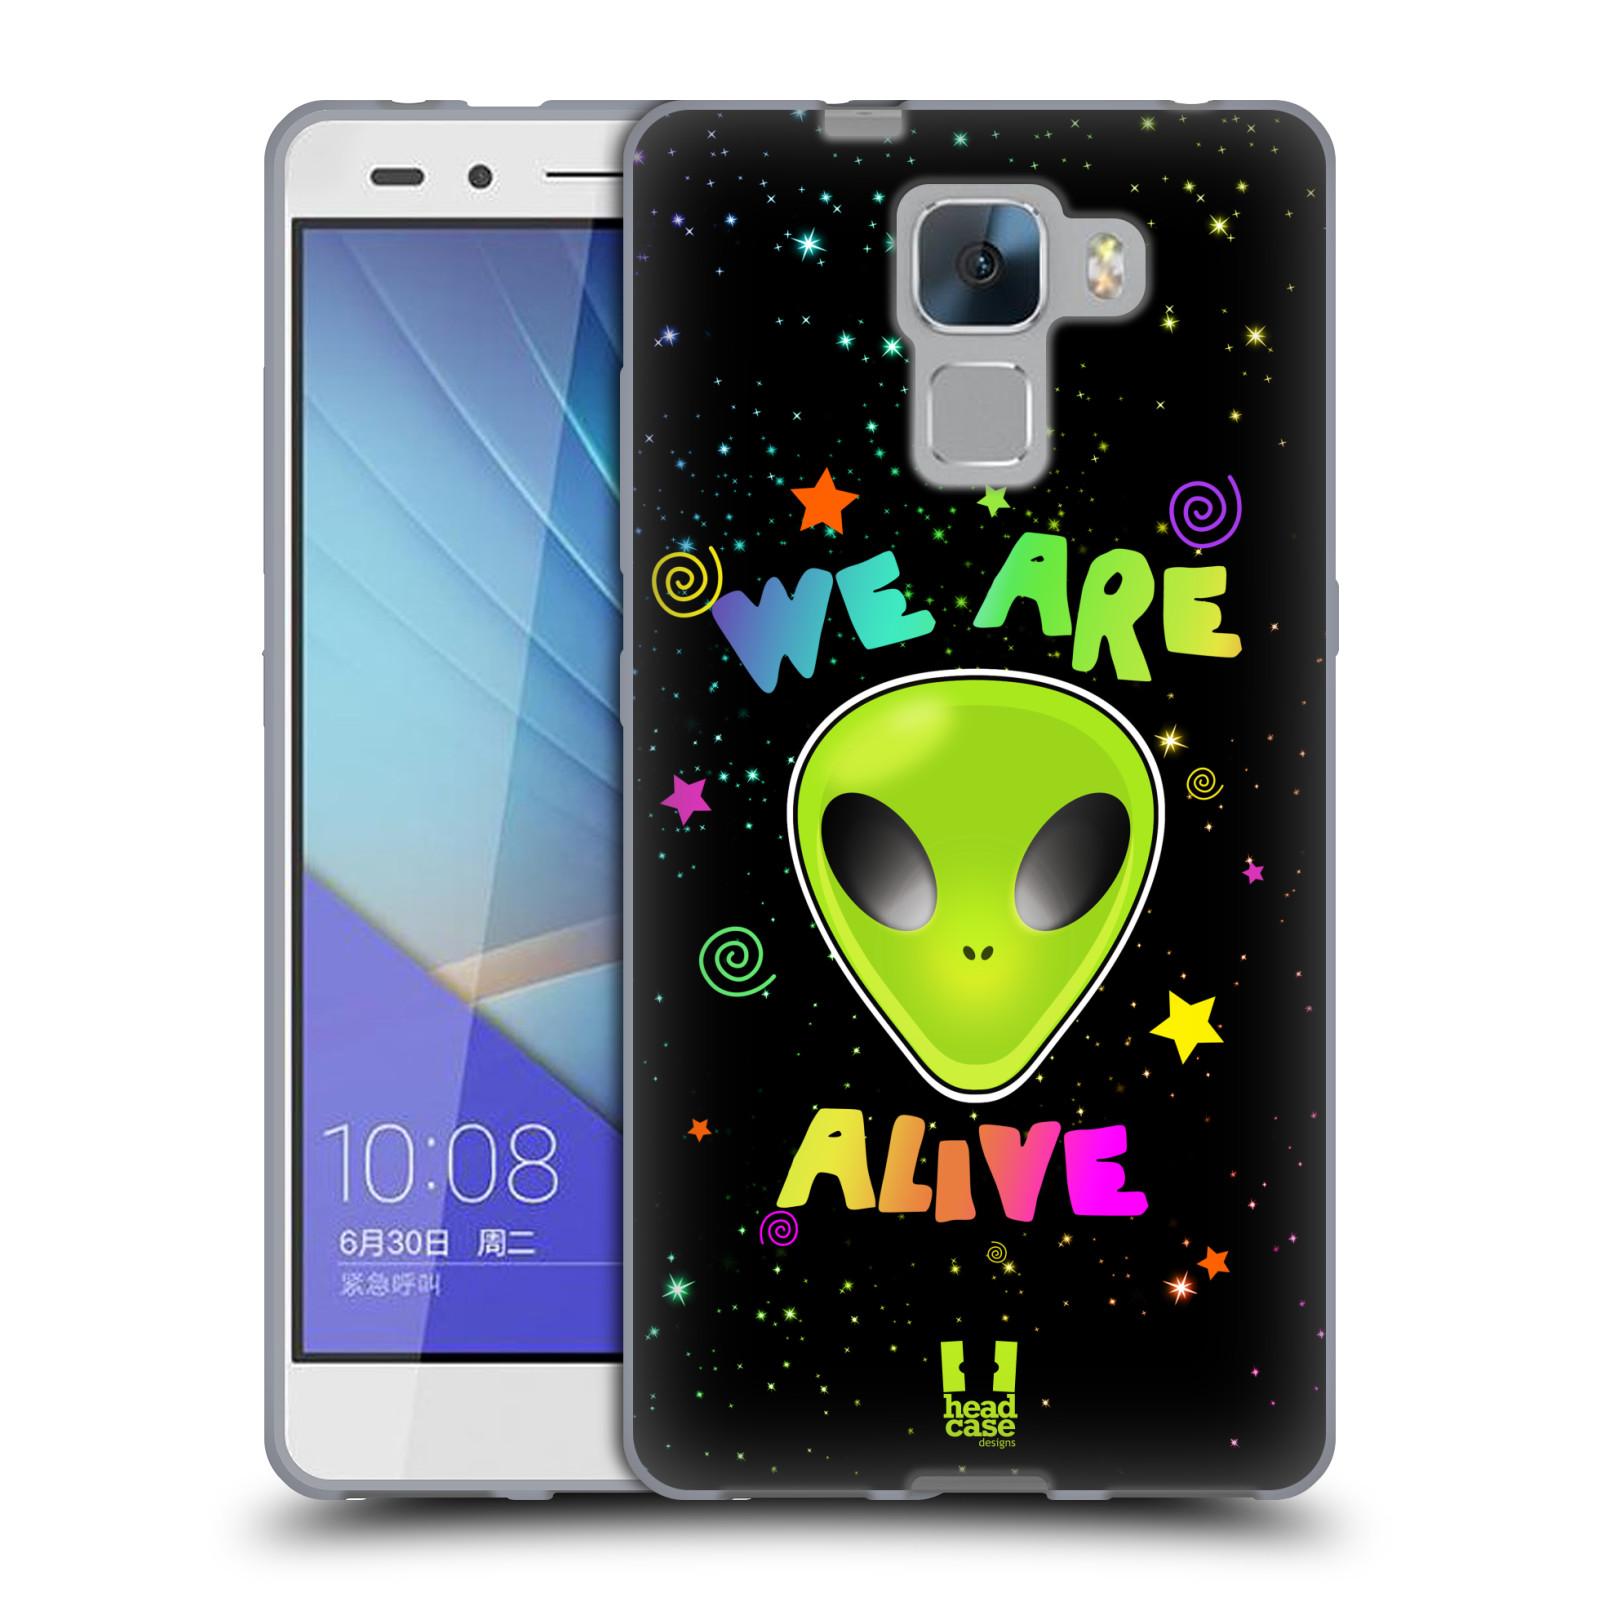 Silikonové pouzdro na mobil Honor 7 HEAD CASE ALIENS ALIVE